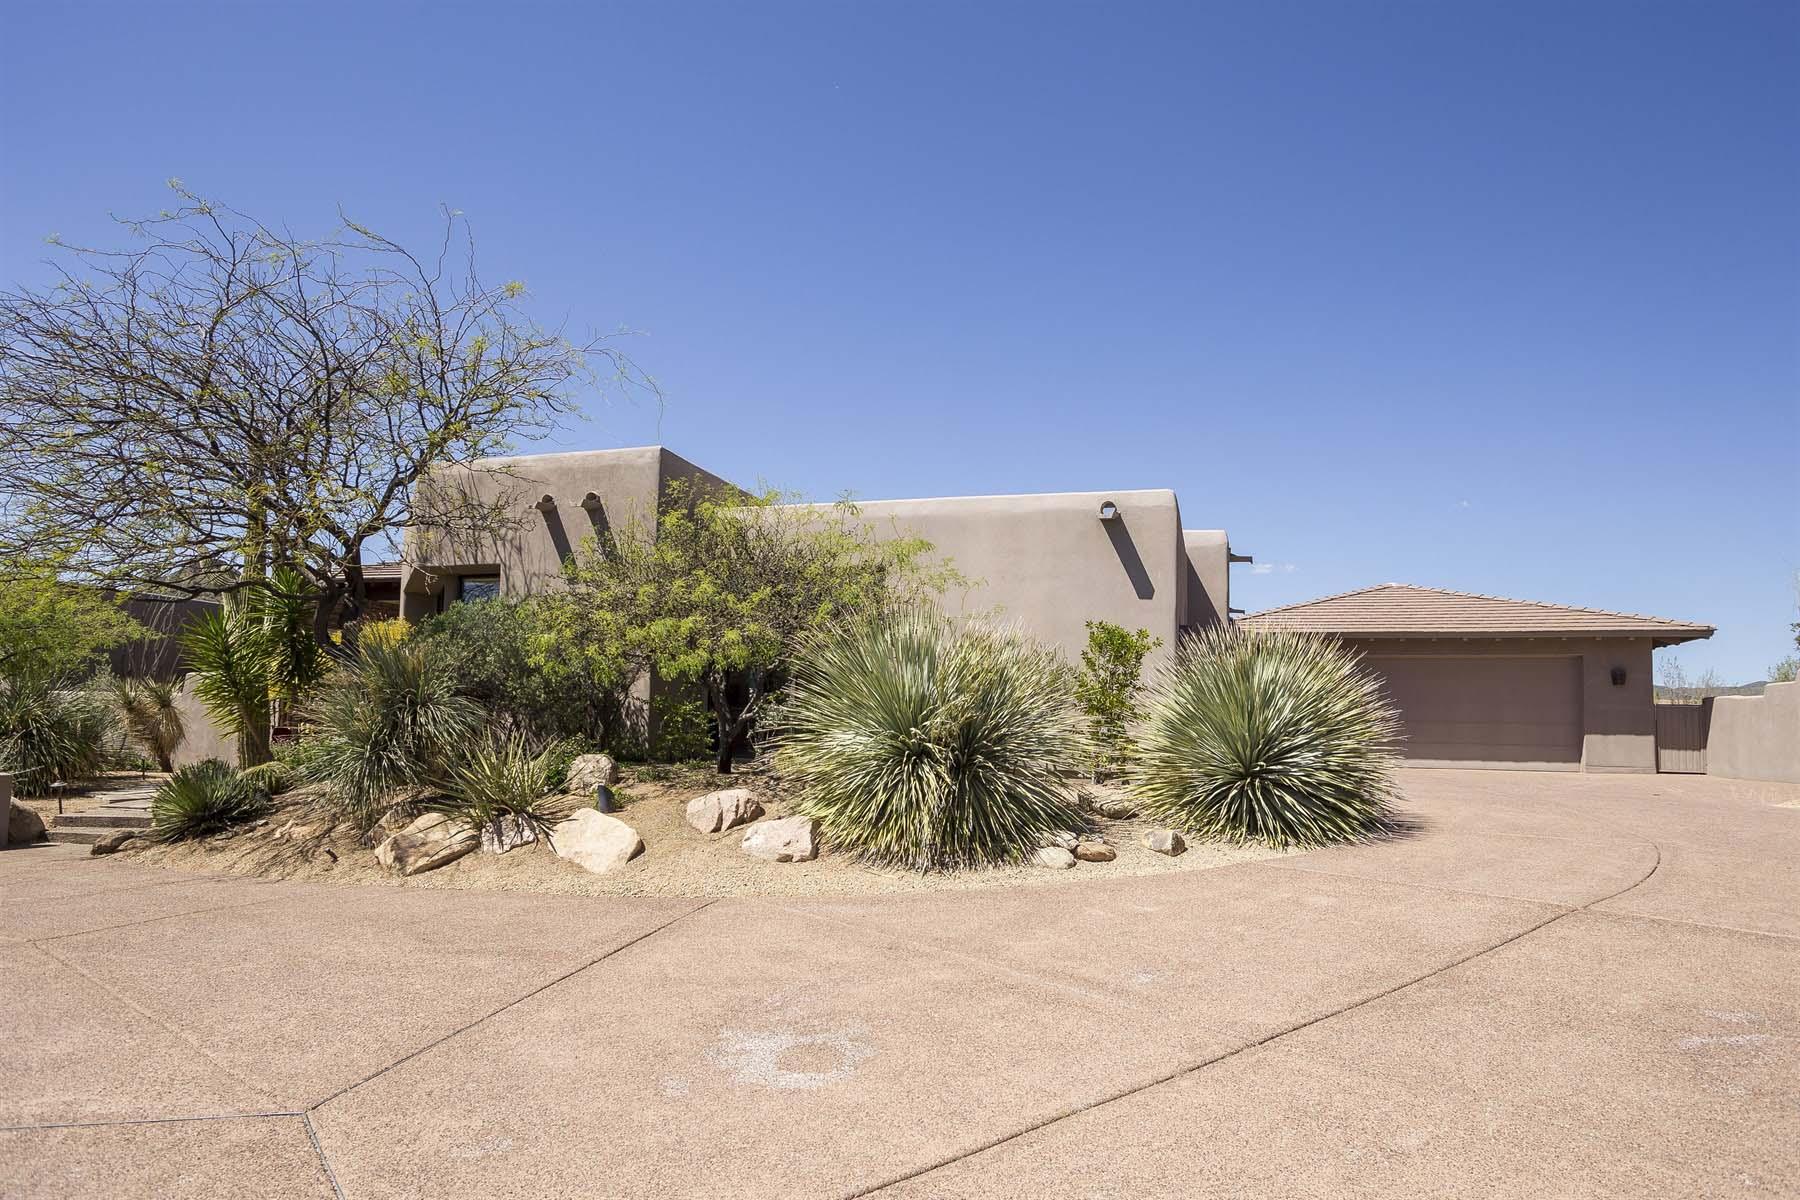 Single Family Home for Sale at wonderful Home in DesertMountain Skyline. 39640 N 100TH ST Scottsdale, Arizona SCOTT United States